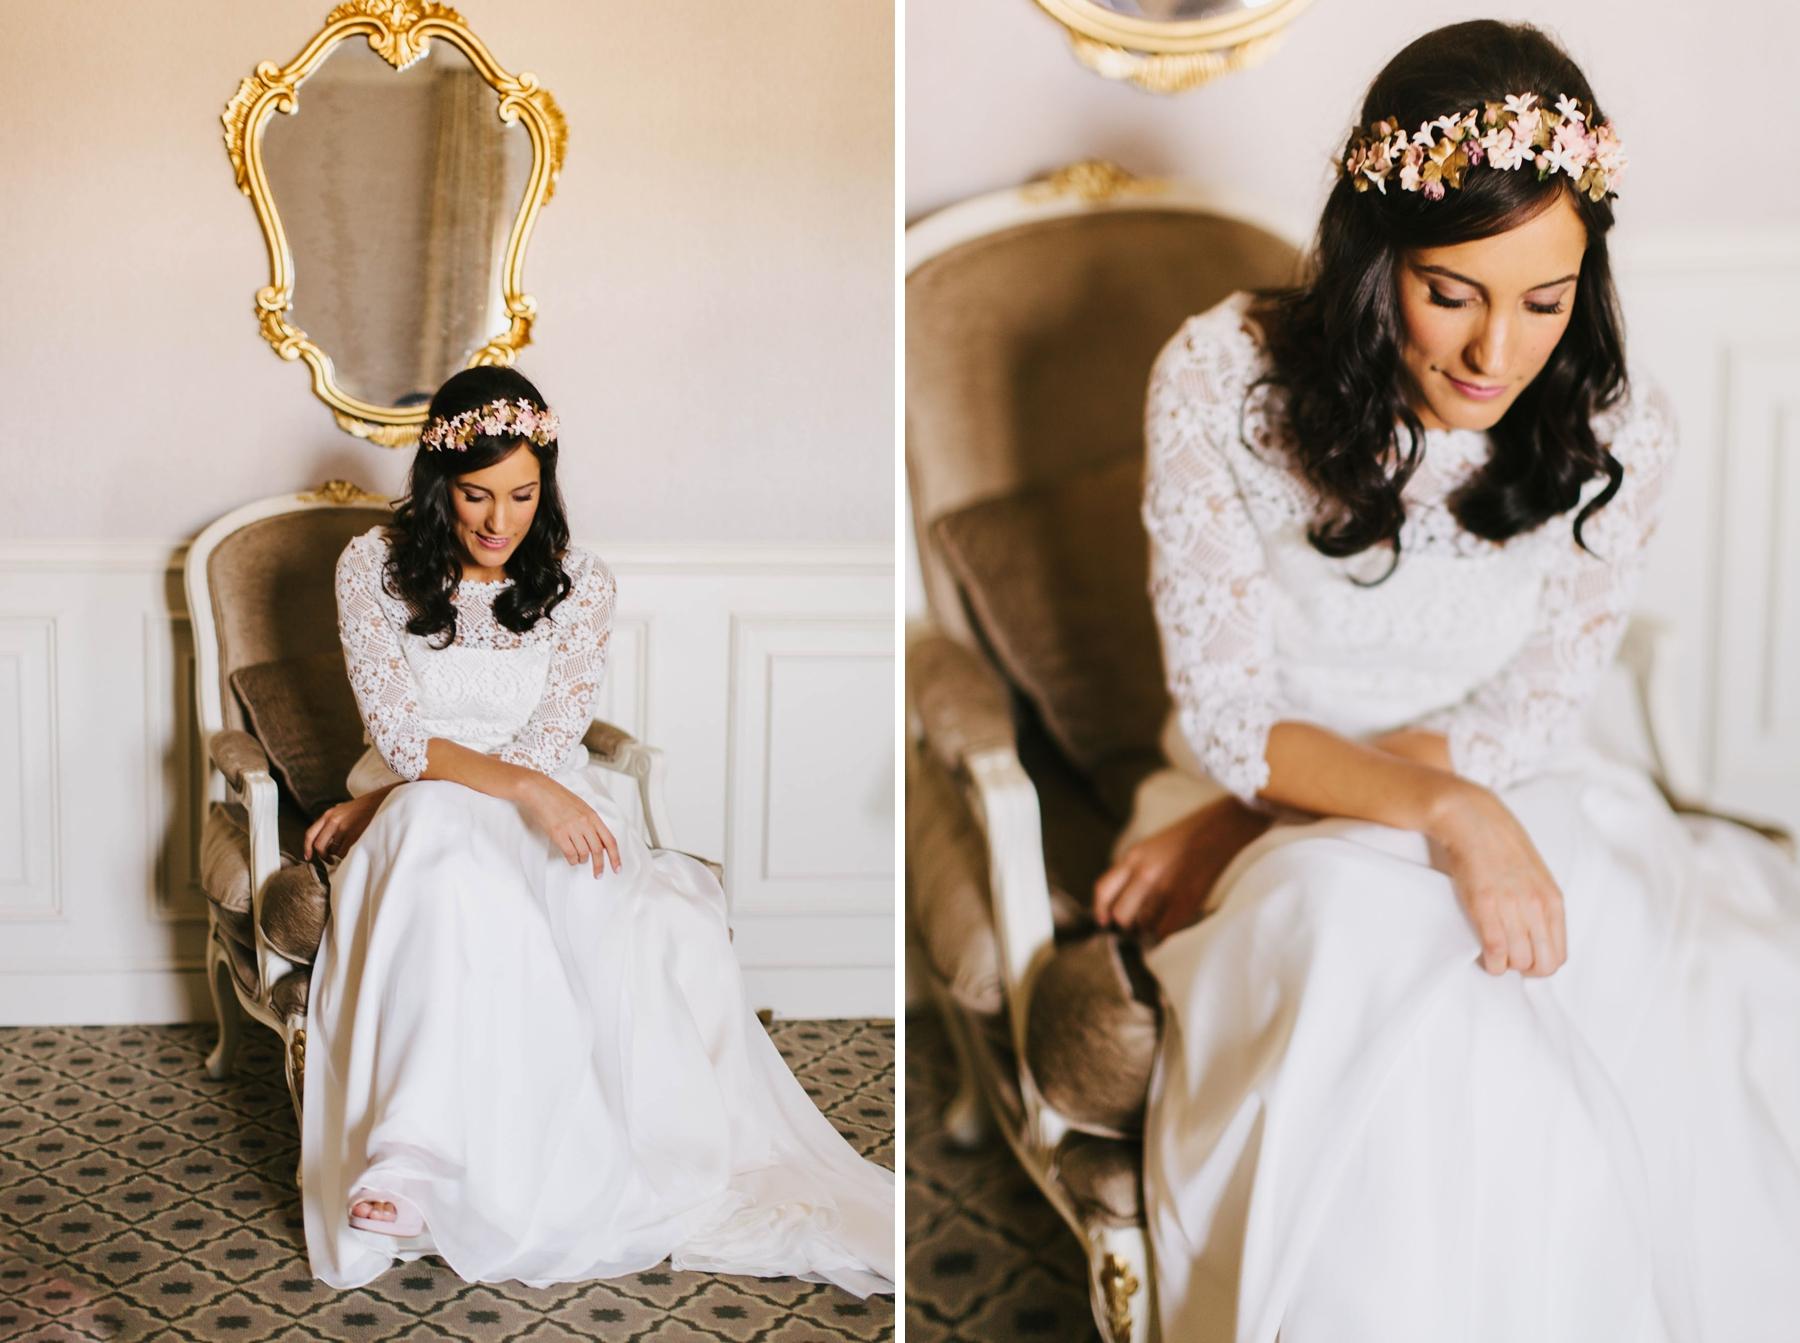 fotografo de bodas Jairo Crena-261